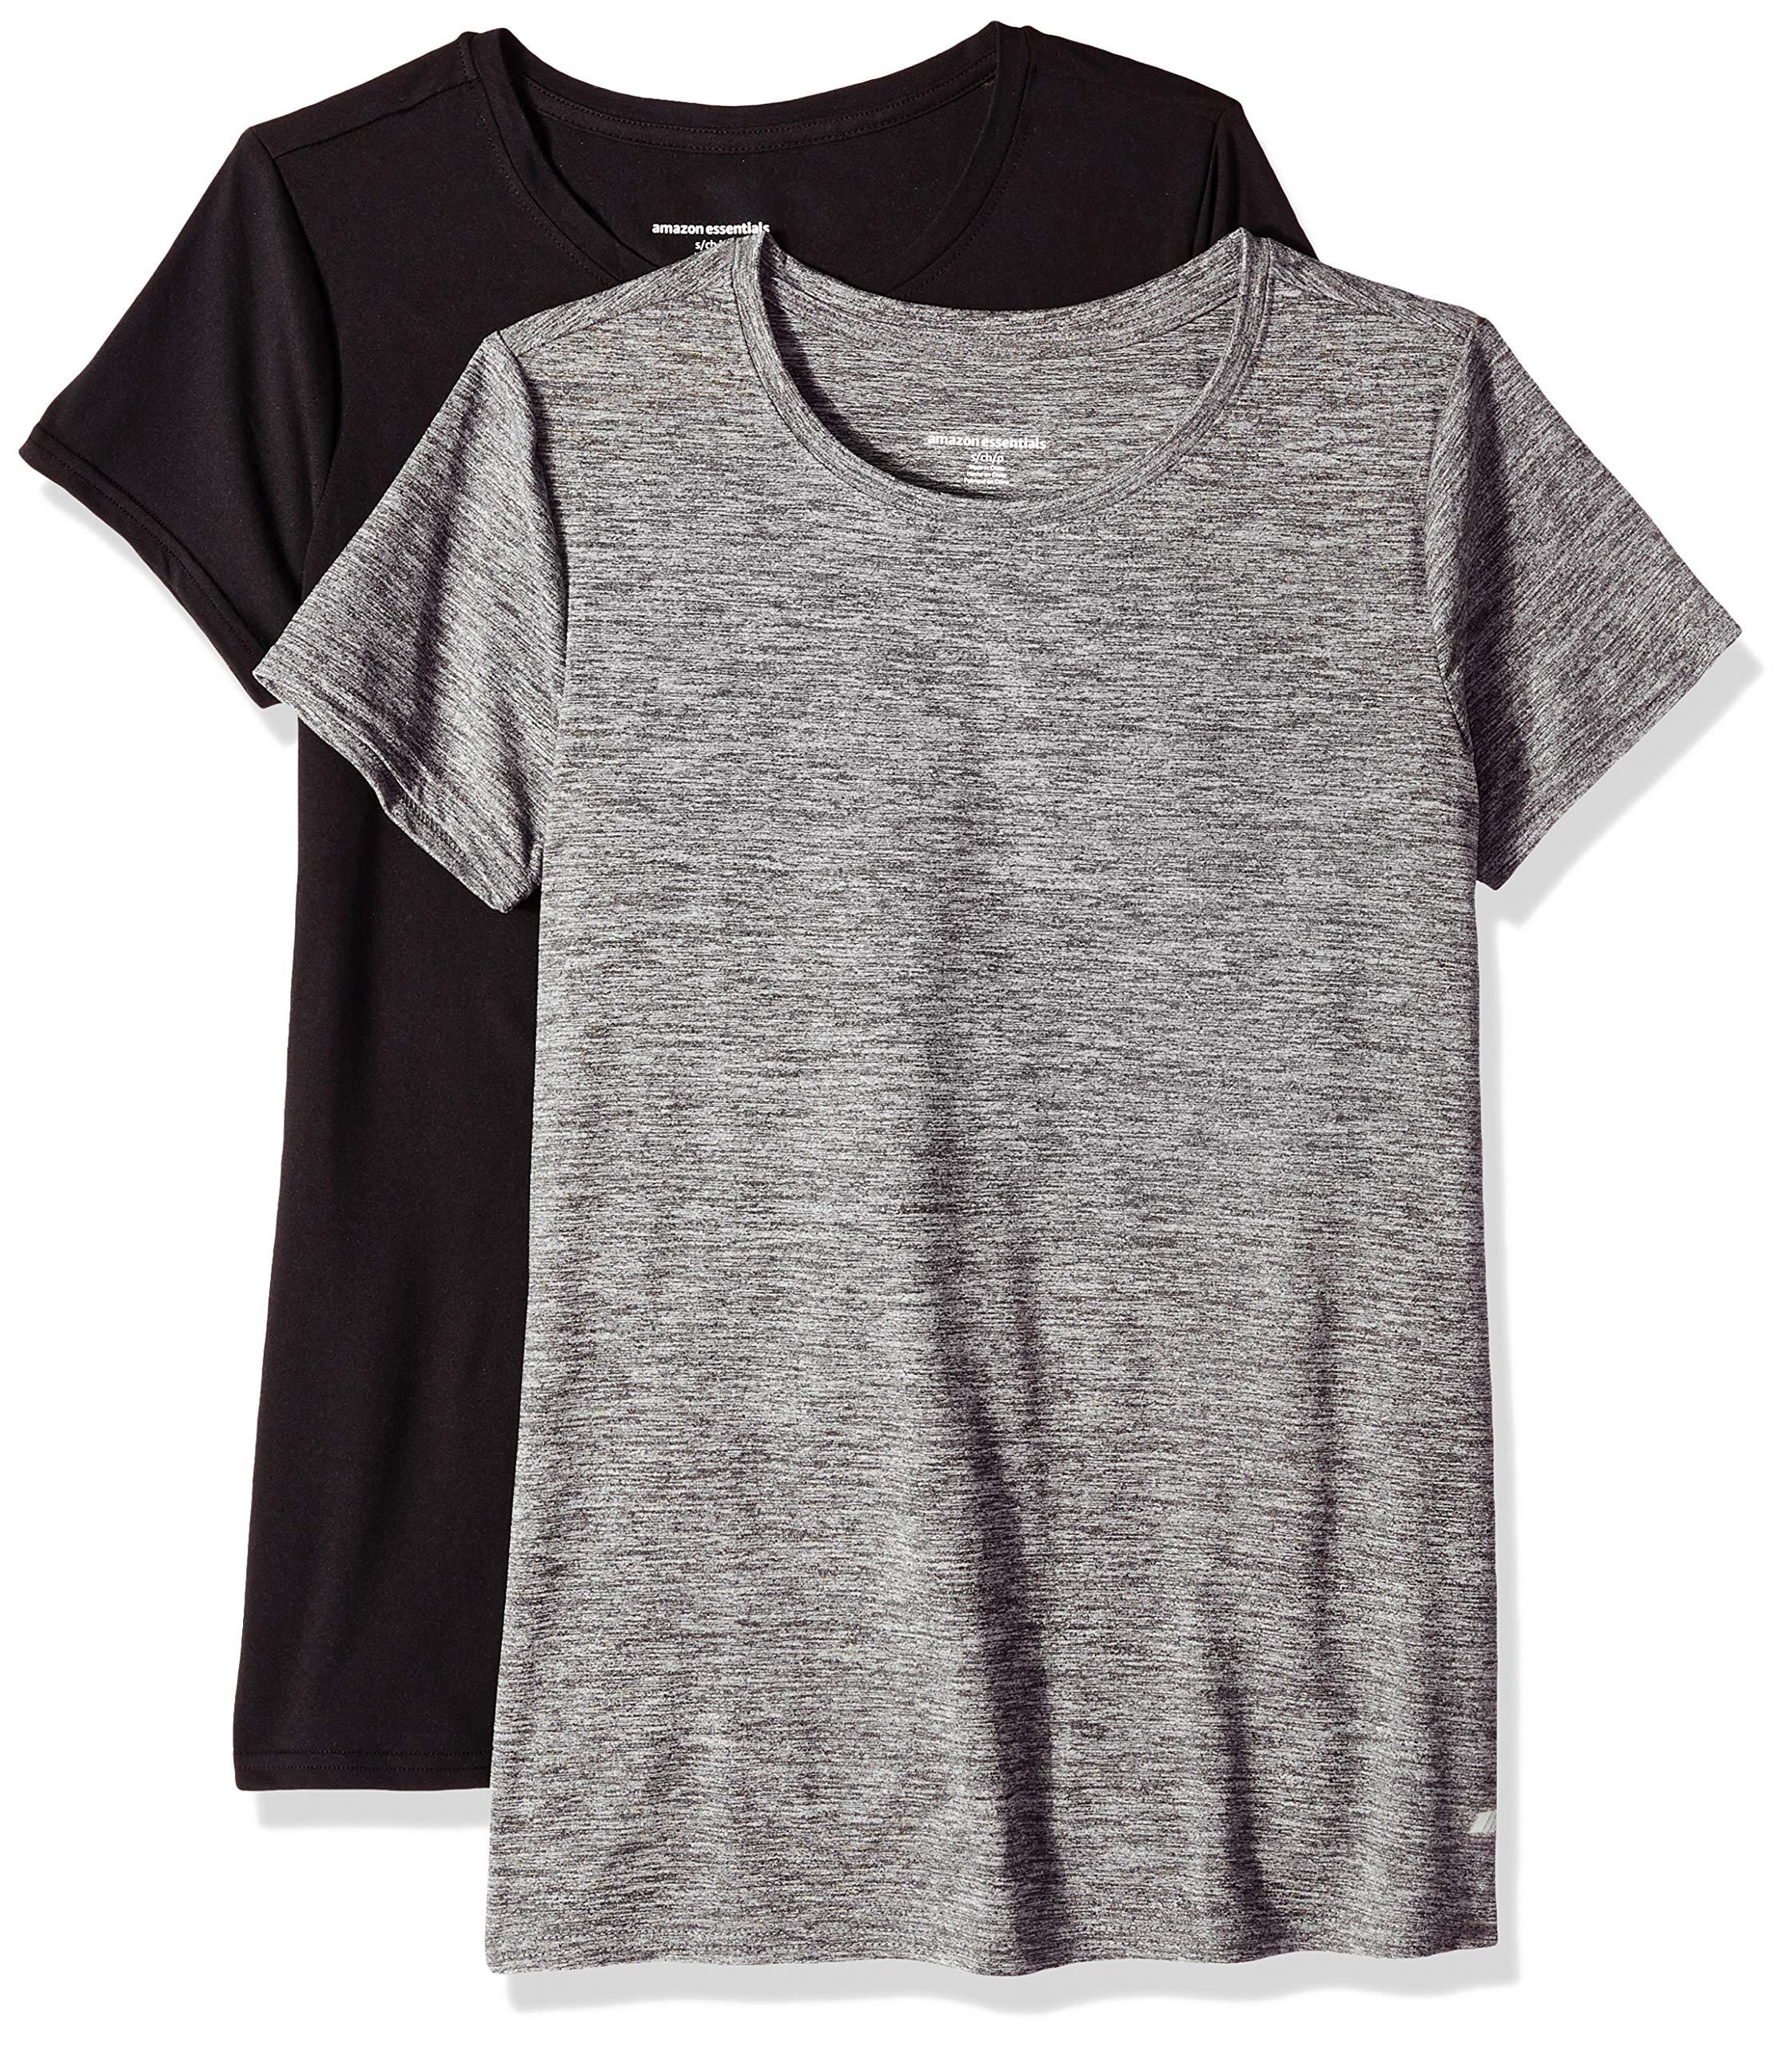 Amazon Essentials Women's 2-Pack Tech Stretch Short-Sleeve Crewneck T-Shirt, -black space dye/black, Medium by Amazon Essentials (Image #1)